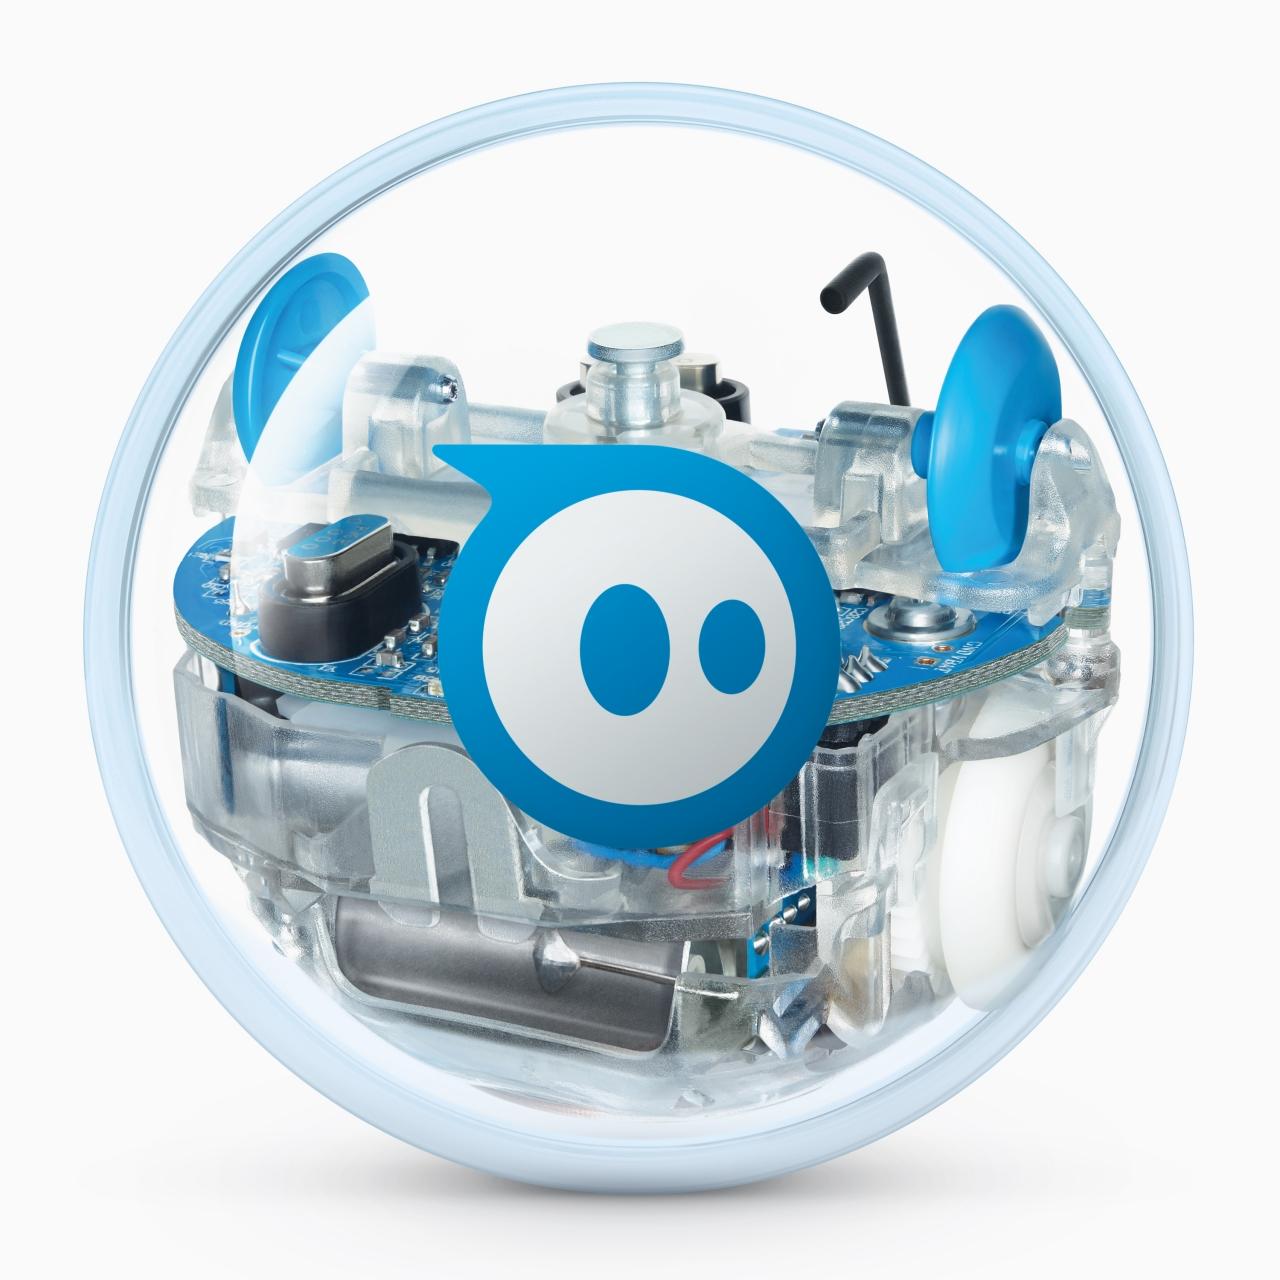 sihirli-elma-swift-playgorunds-1-5-sphero-sprk-plus-robot